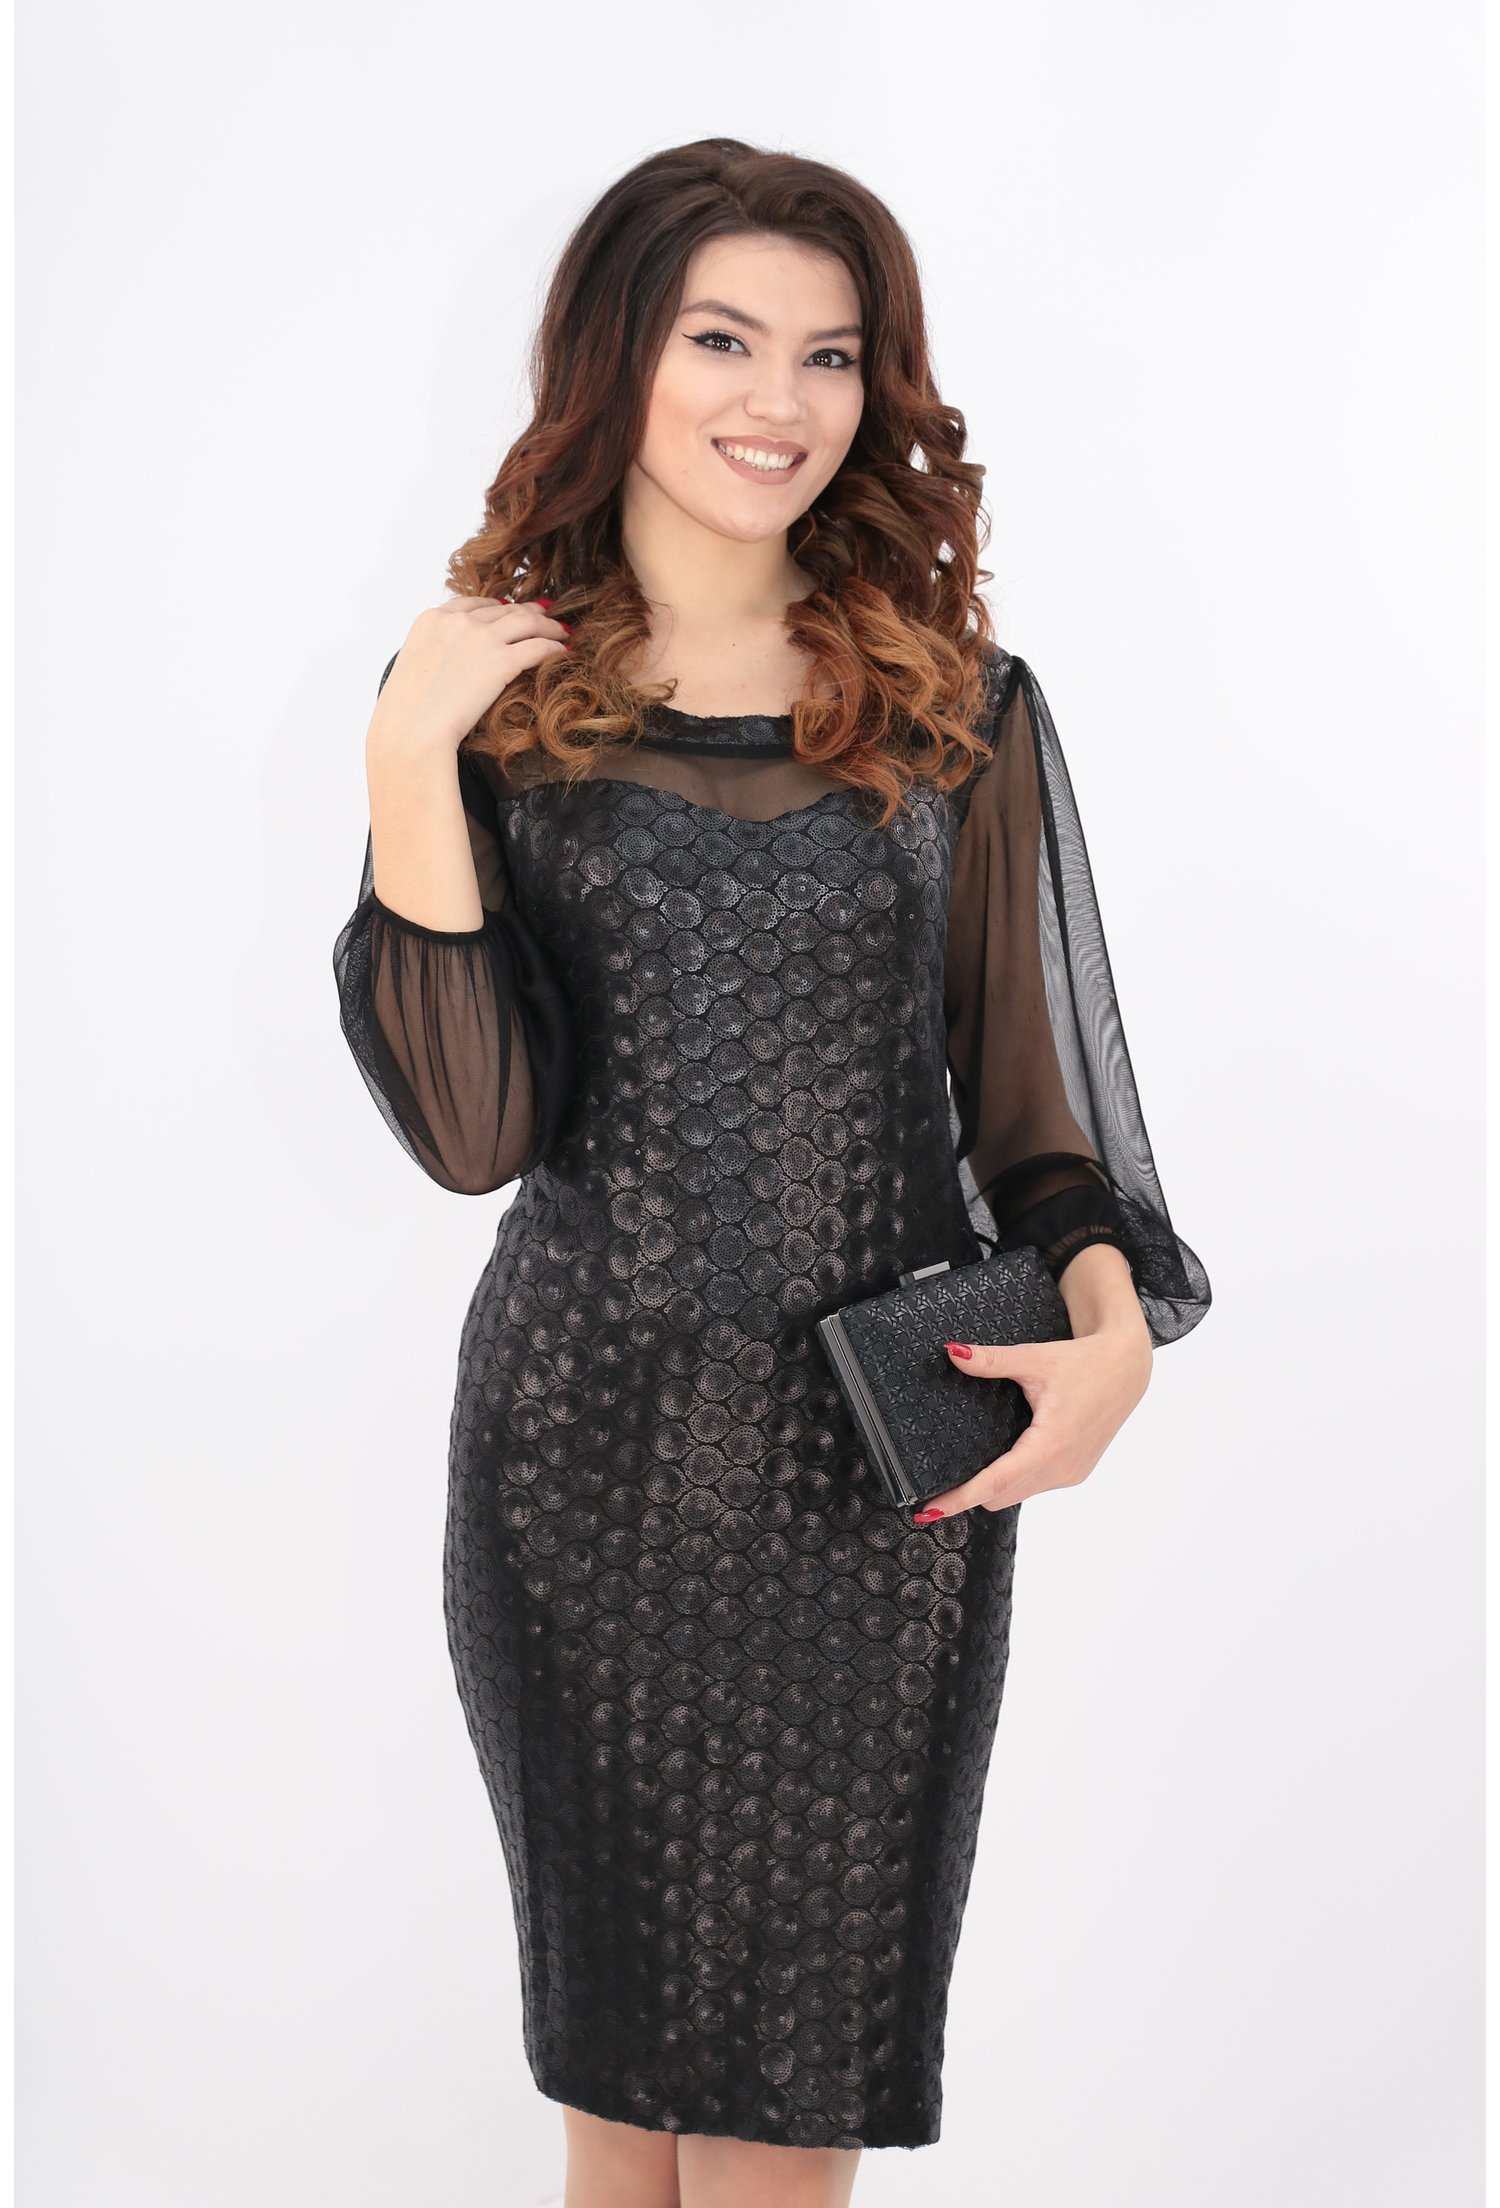 Rochie cu paiete negre si maneci din tull